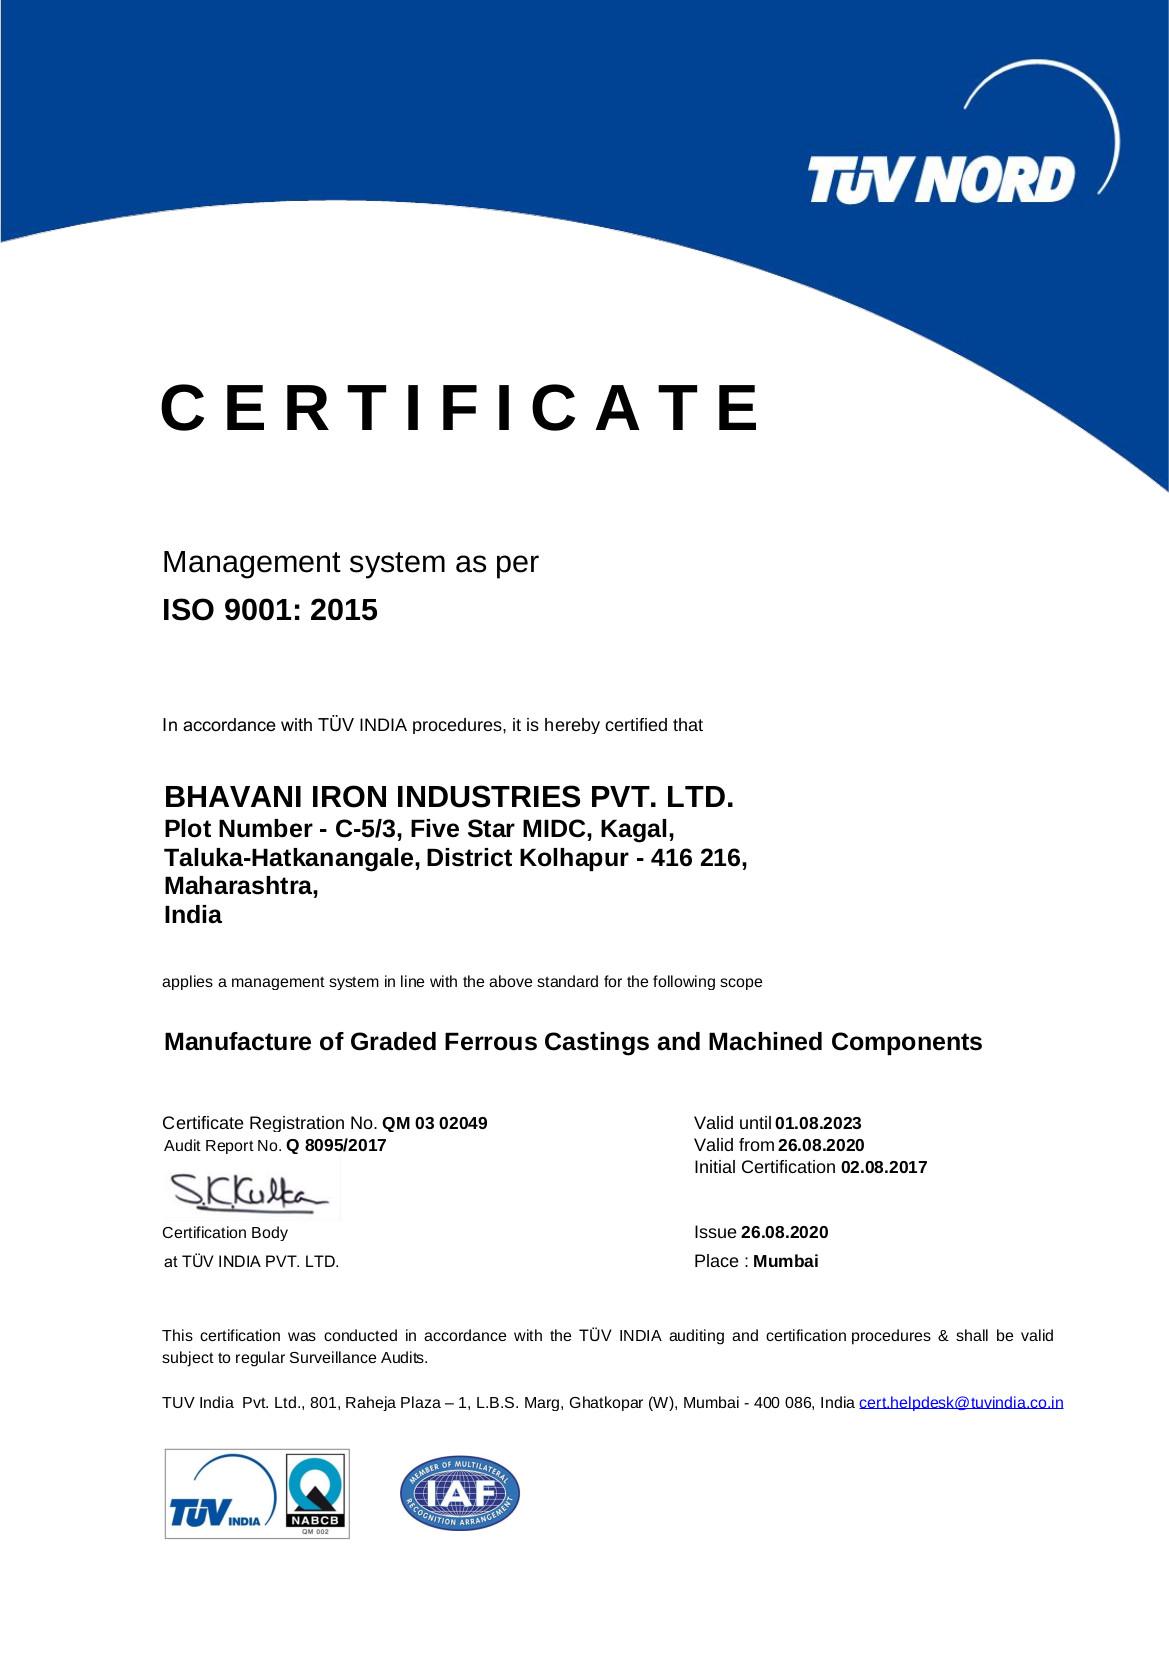 Bhavani Iron Industries Pvt  Ltd , Manufacturers of Heavy & graded